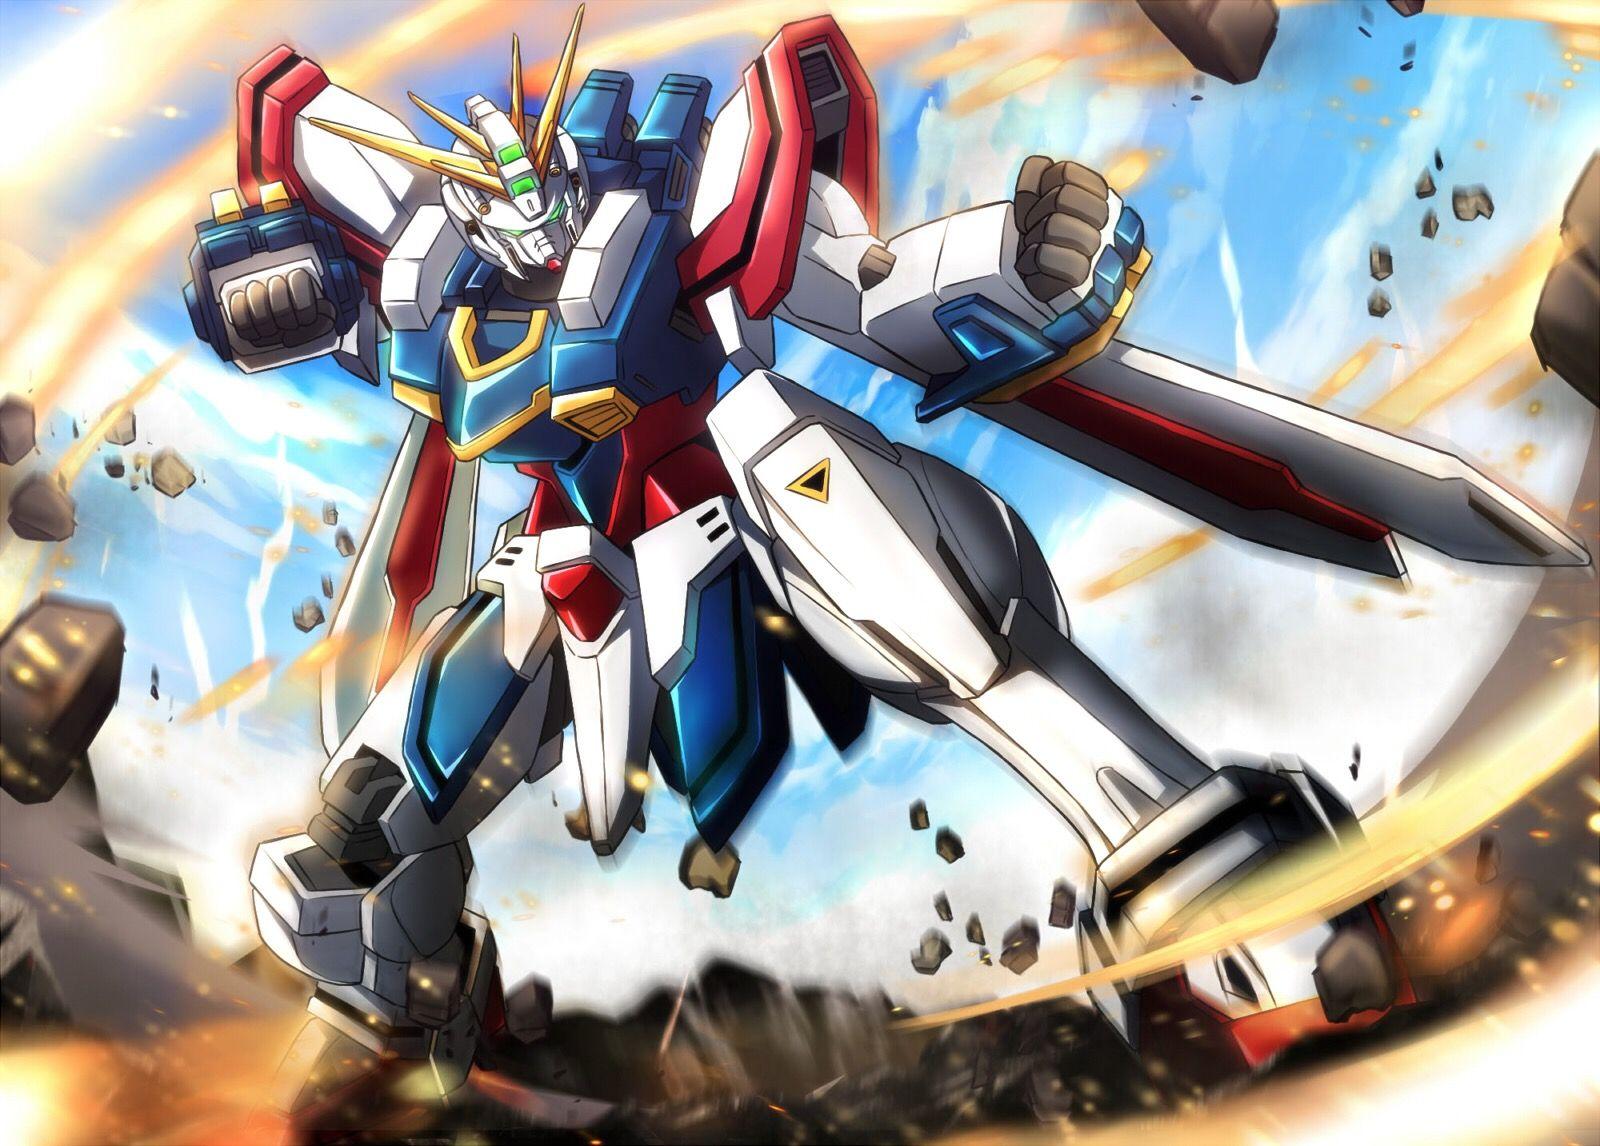 Mobile Fighter G Gundam Gf13 017njii God Gundam Mobile Fighter G Gundam Gundam Art Gundam